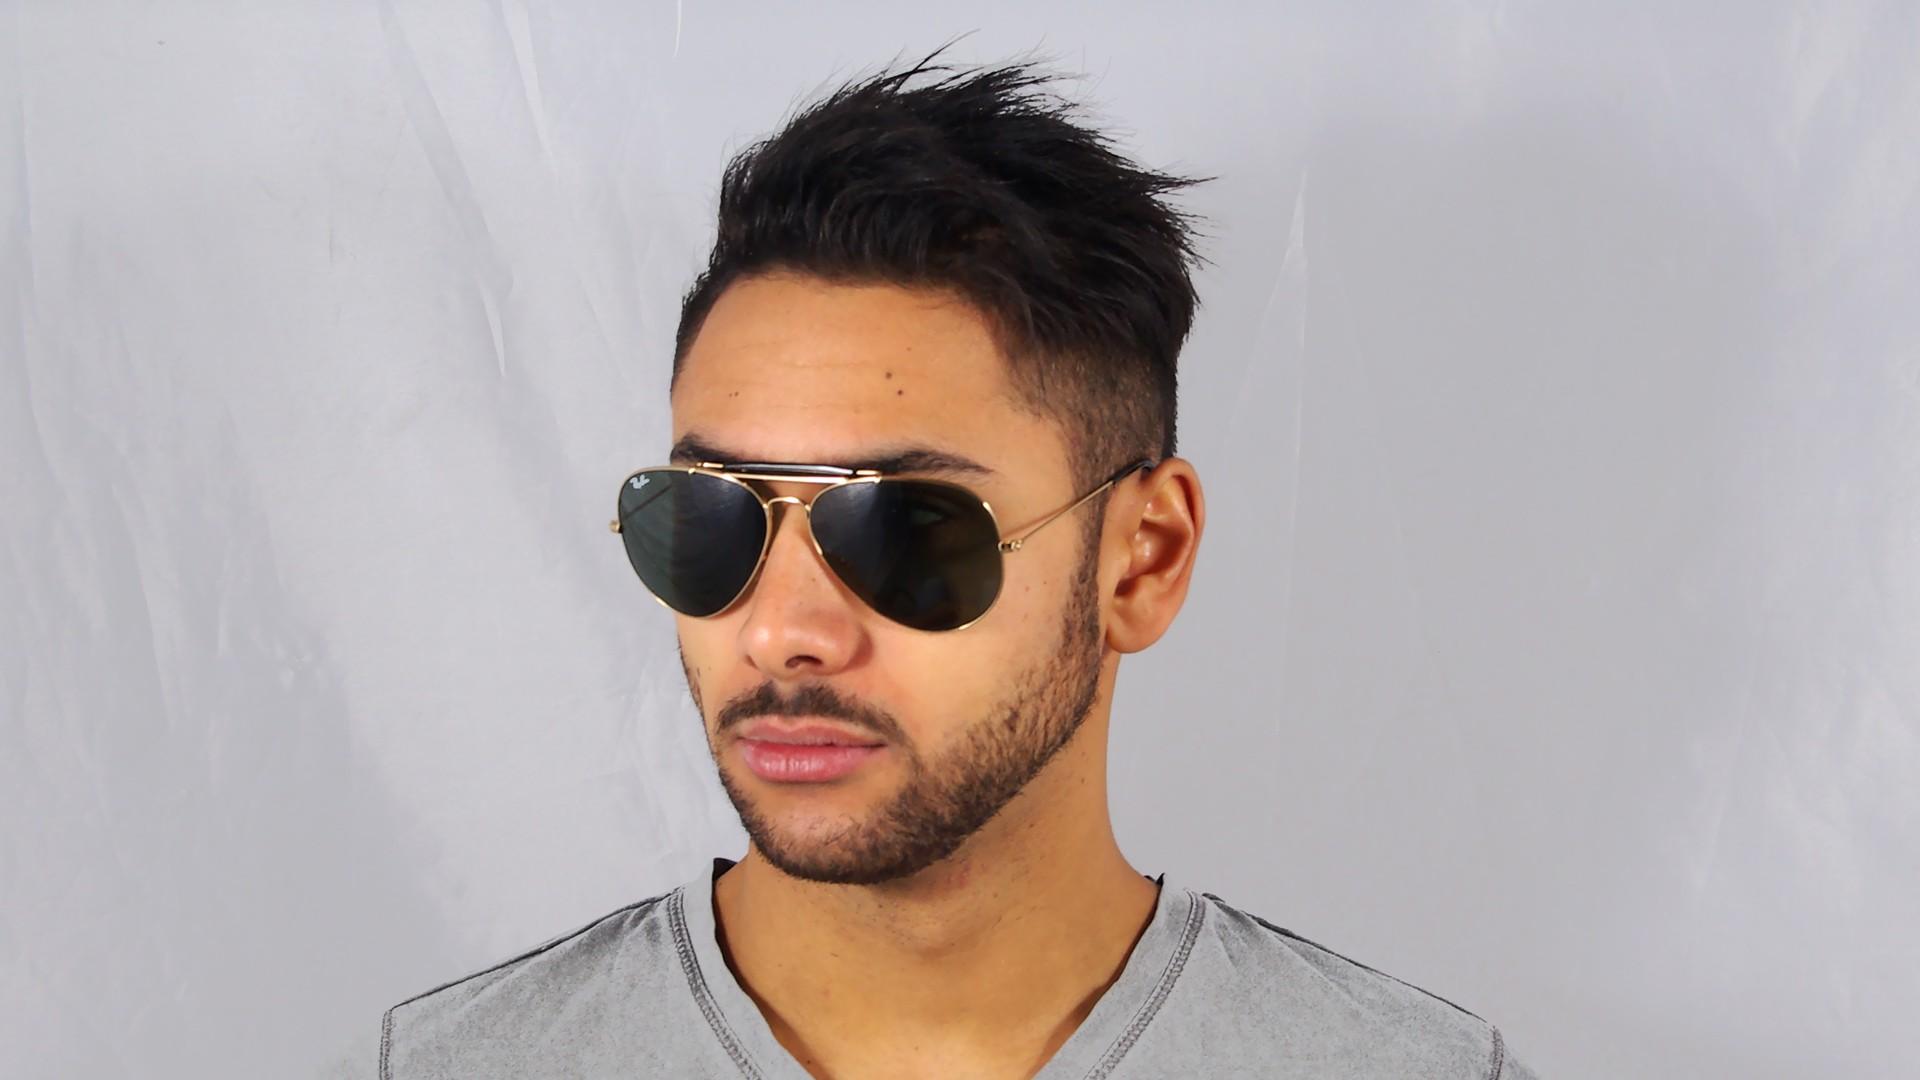 d26b65fb85 Sunglasses Ray-Ban Outdoorsman II Havane Gold RB3029 181 62-14 Large